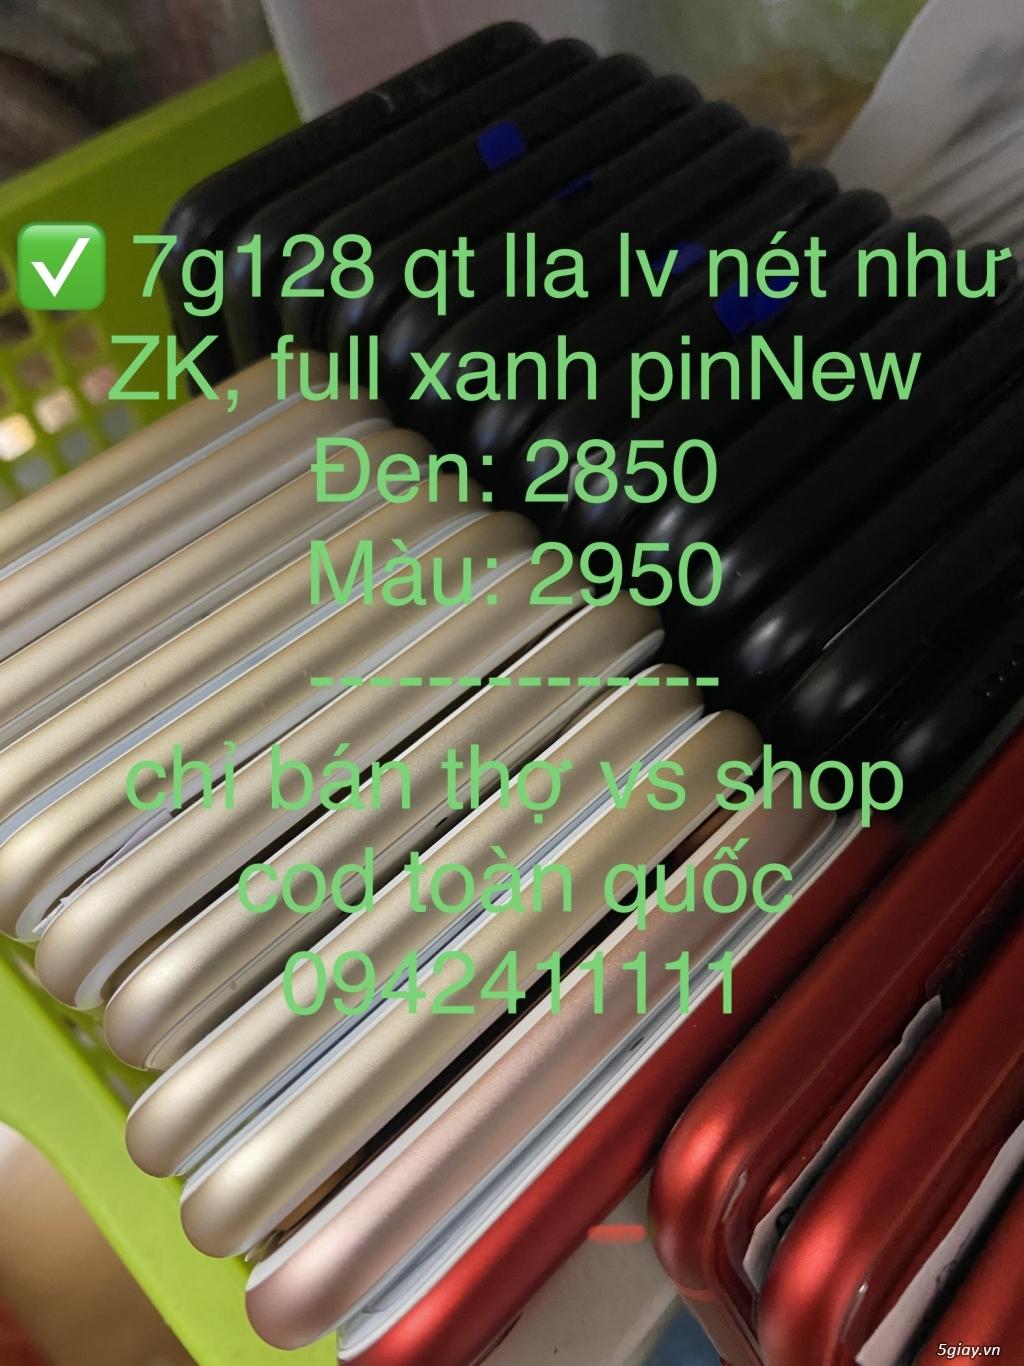 Bảng Giá Sỉ iPhone 6s   6splus   7g   7plus   8g   8plus QT lla (COD) - 5